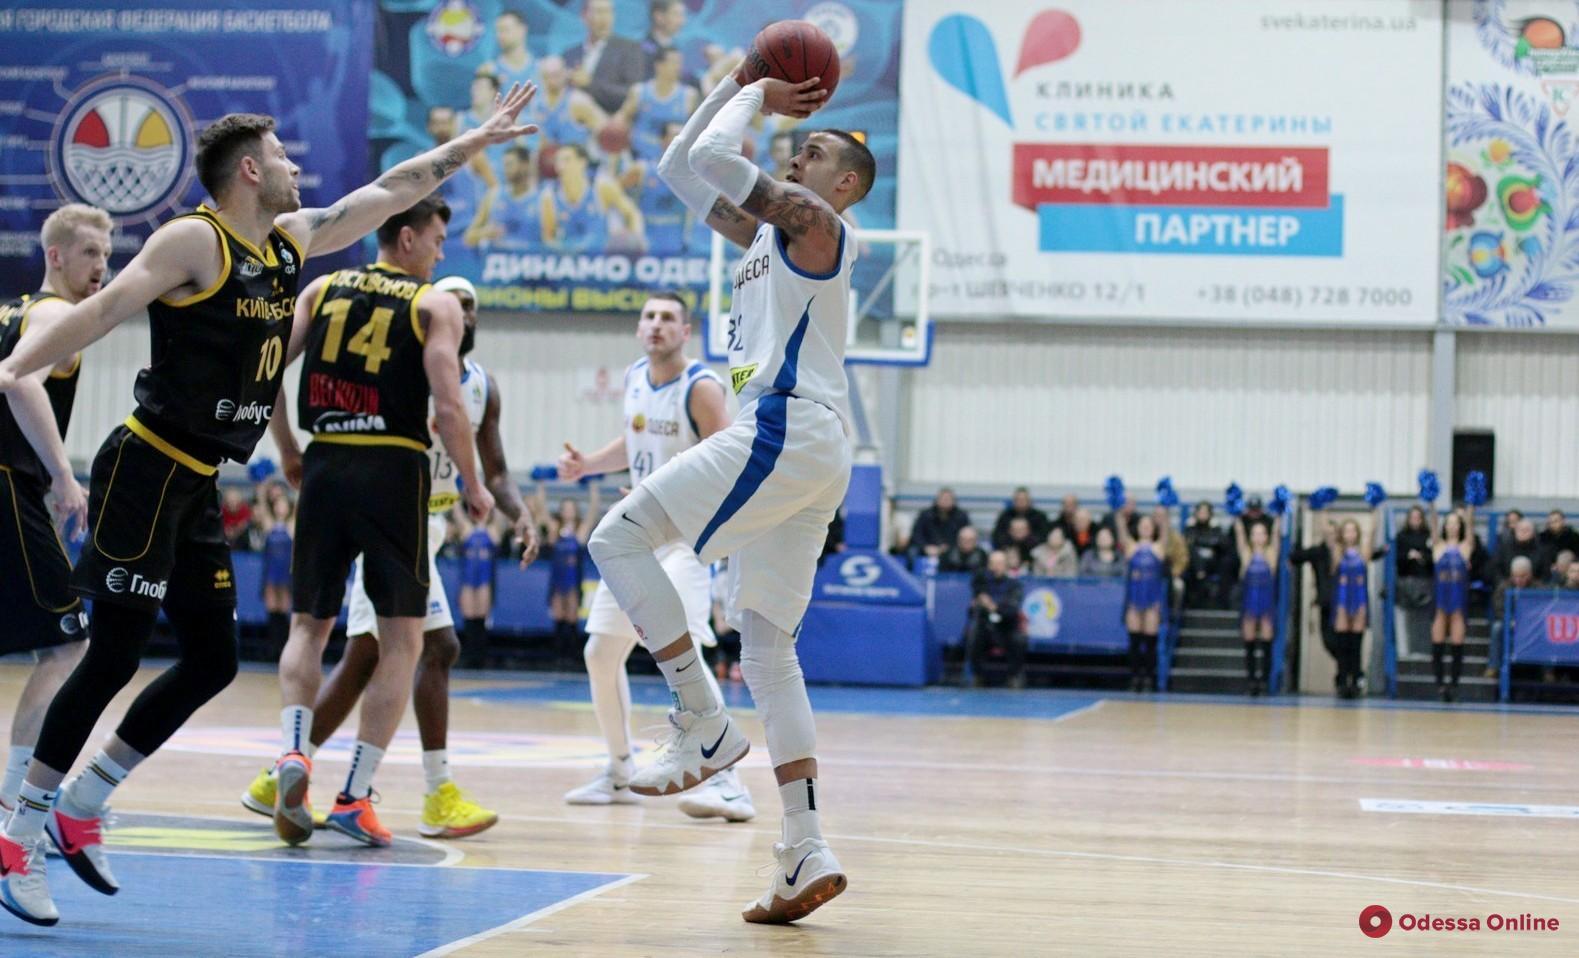 Баскетбол: один из легионеров покинул БК «Одесса»